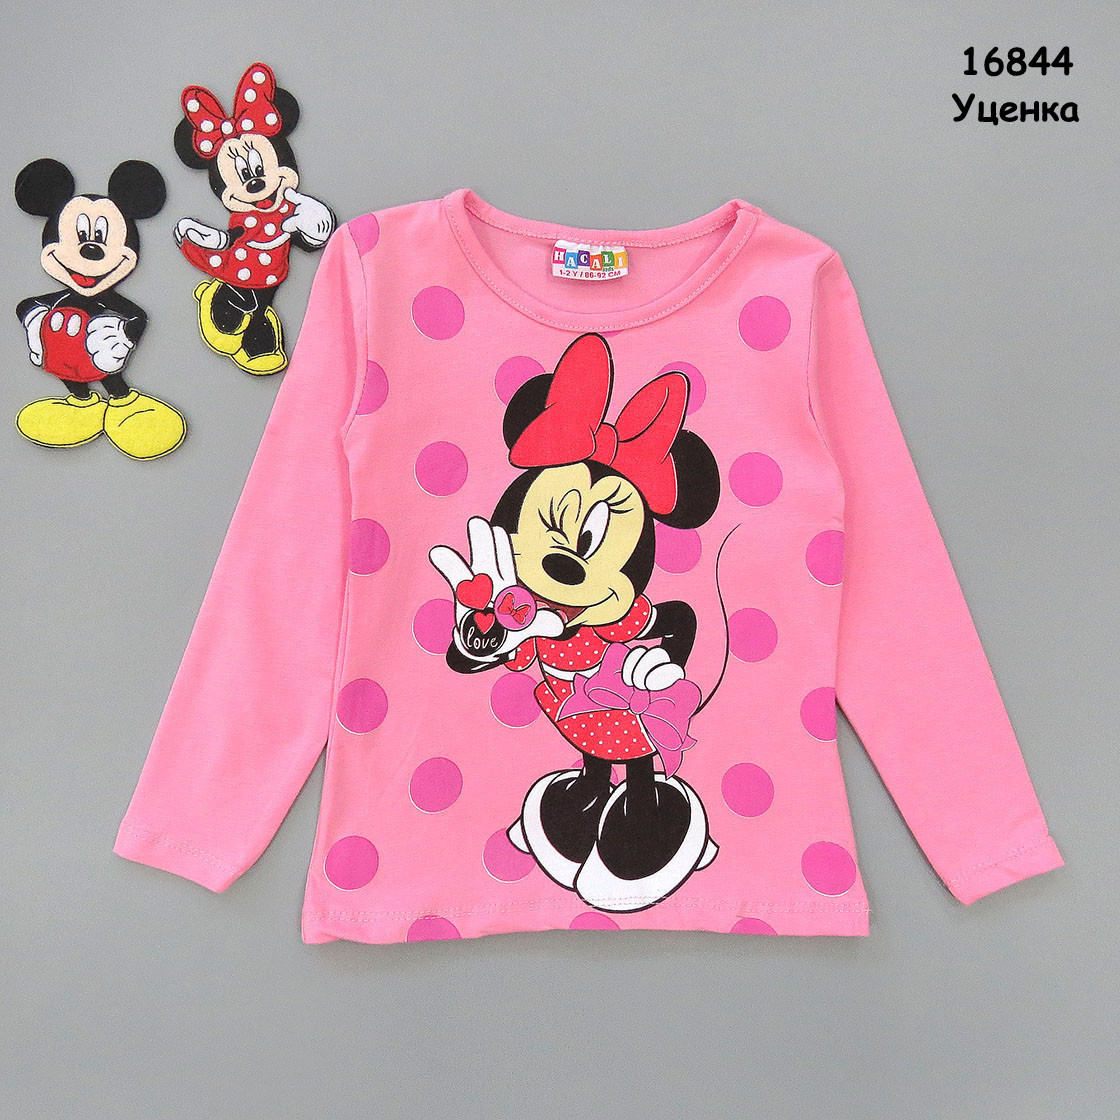 Кофта Minnie Mouse для девочки. 98-104;  122-128 см